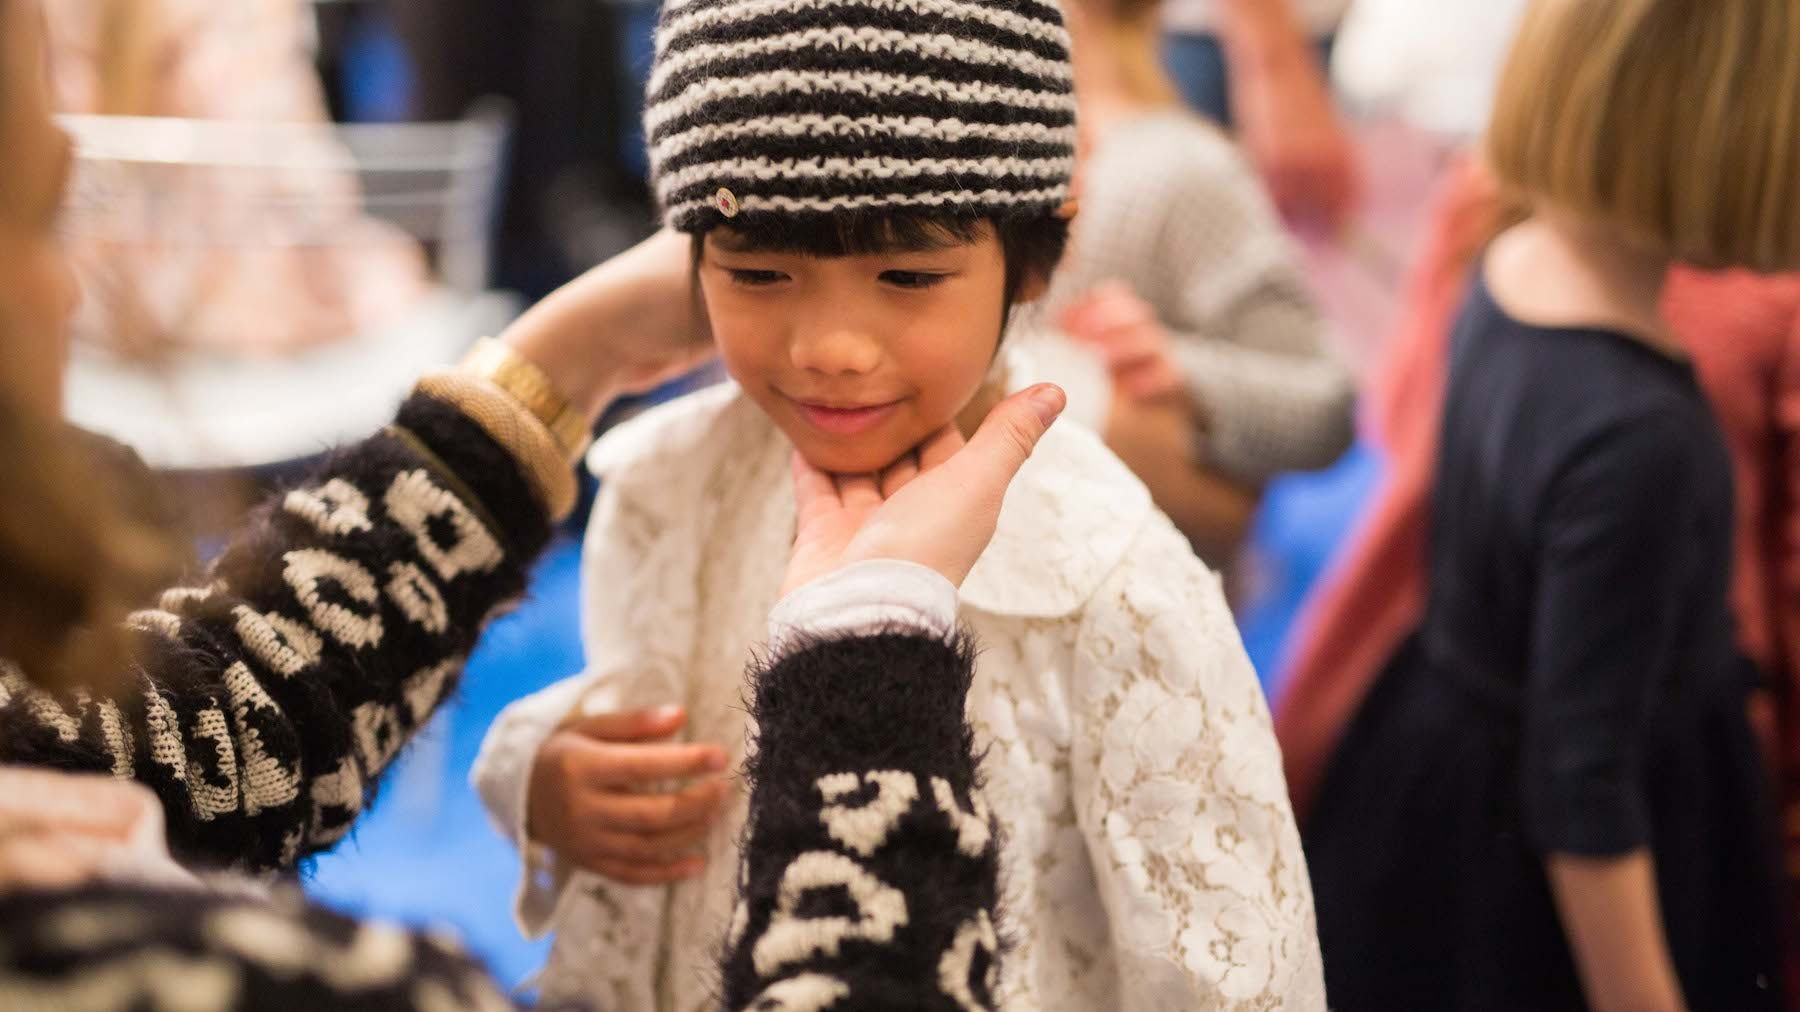 Pitti Immagine Bimbo: At the Heart of the Childrenswear Market